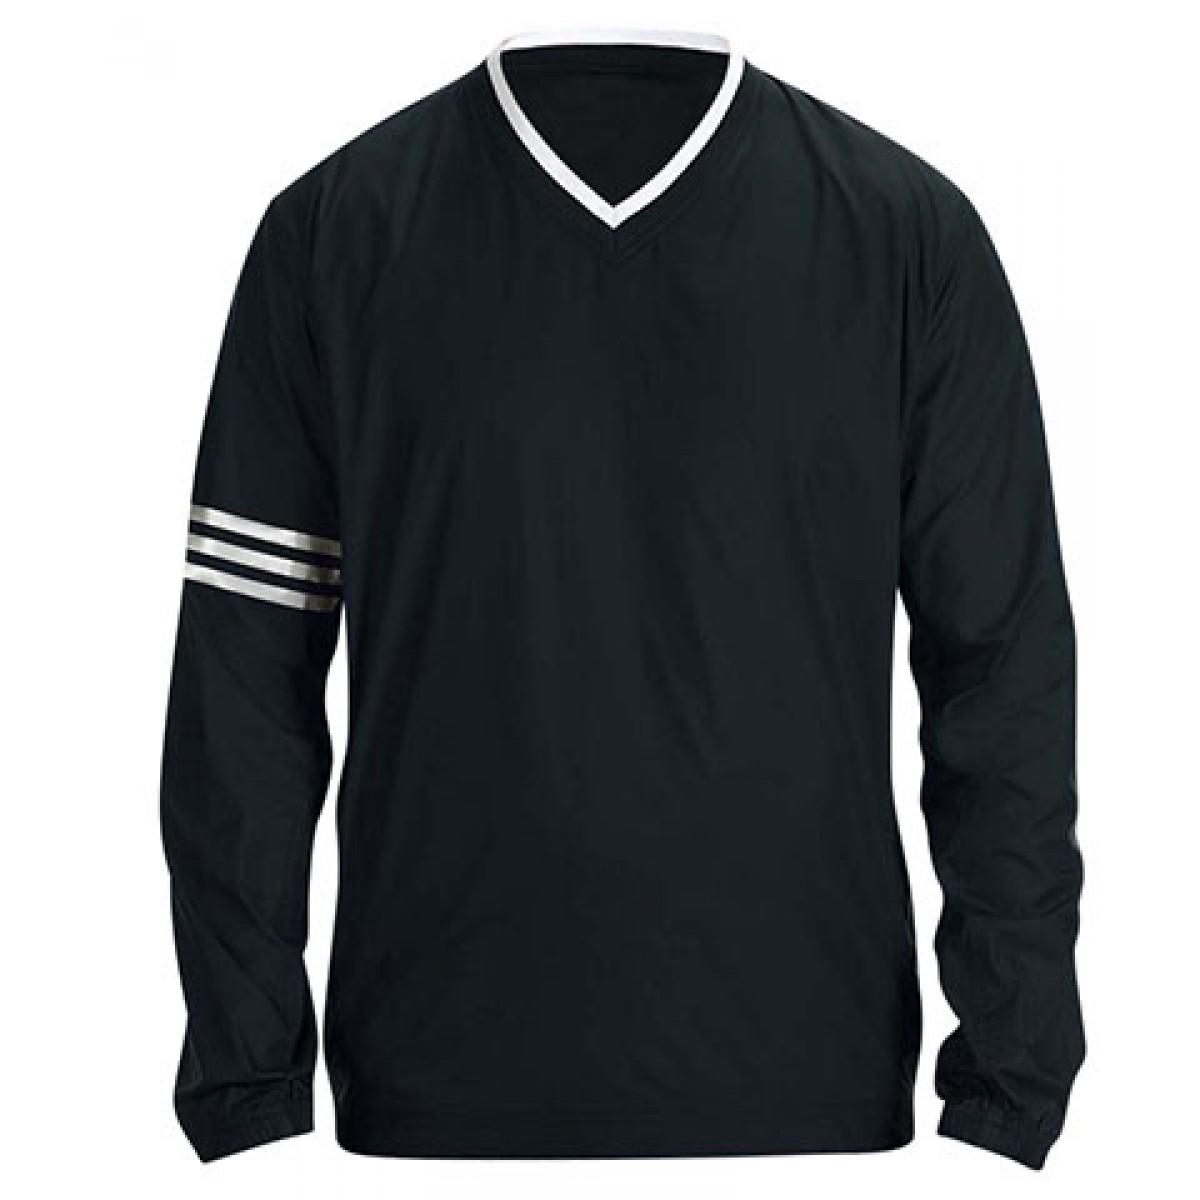 Adidas ClimaLite V-Neck Long Sleeve Wind Shirt-Black-XL